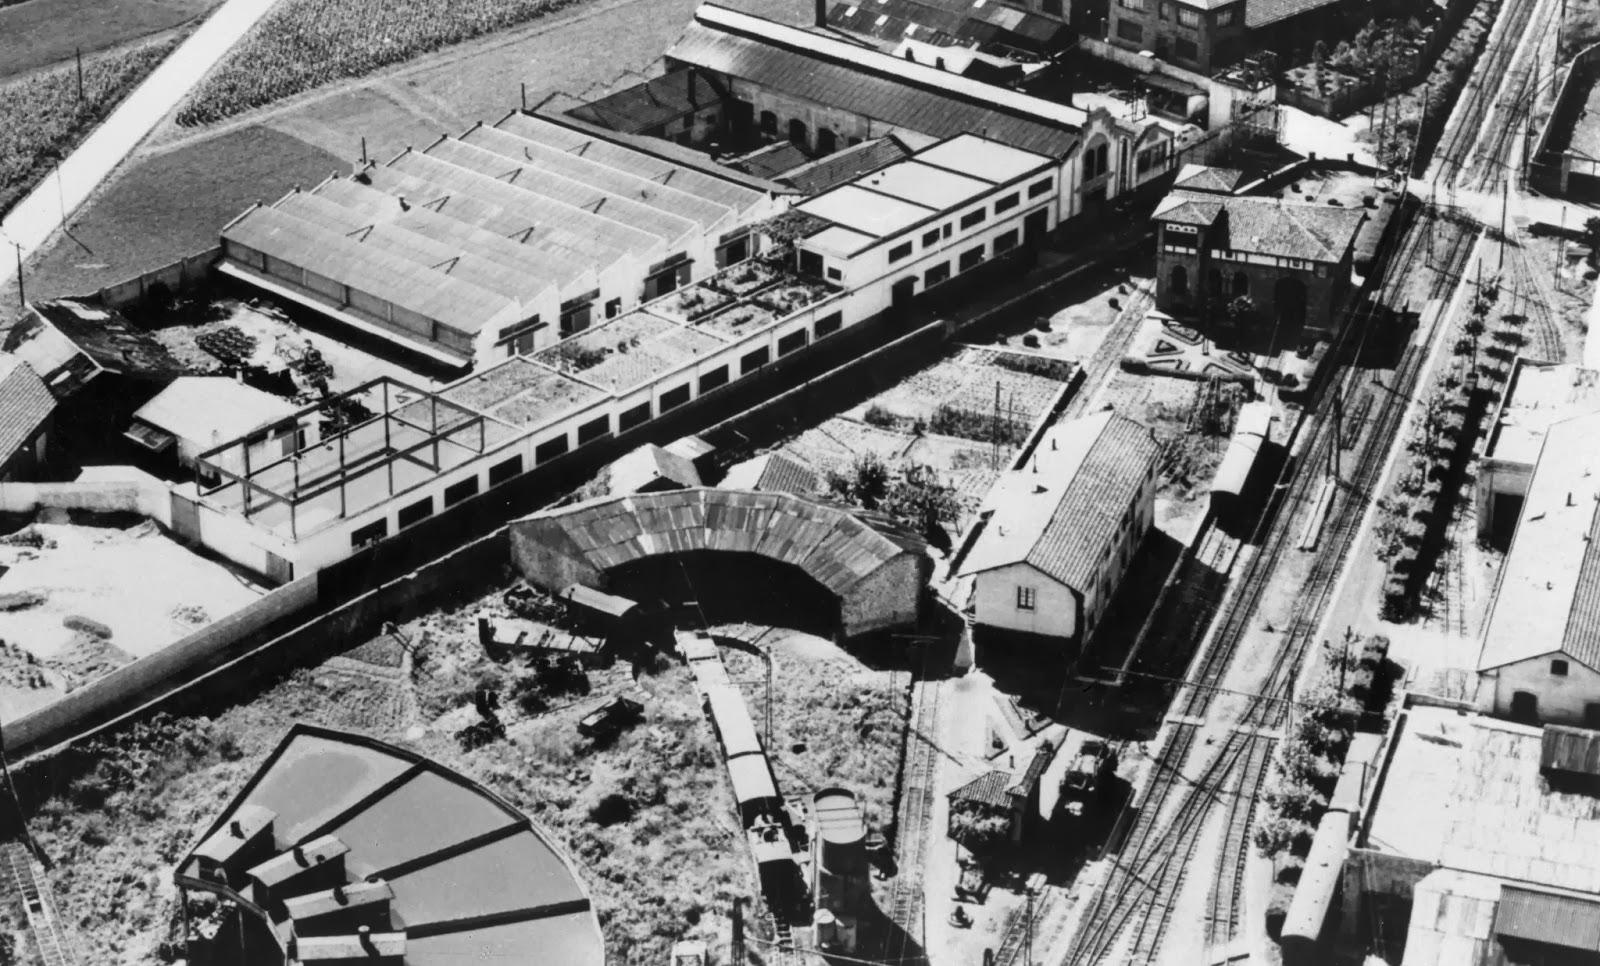 Durango vista aerea de la estacion, fondo Euskotren, MVF